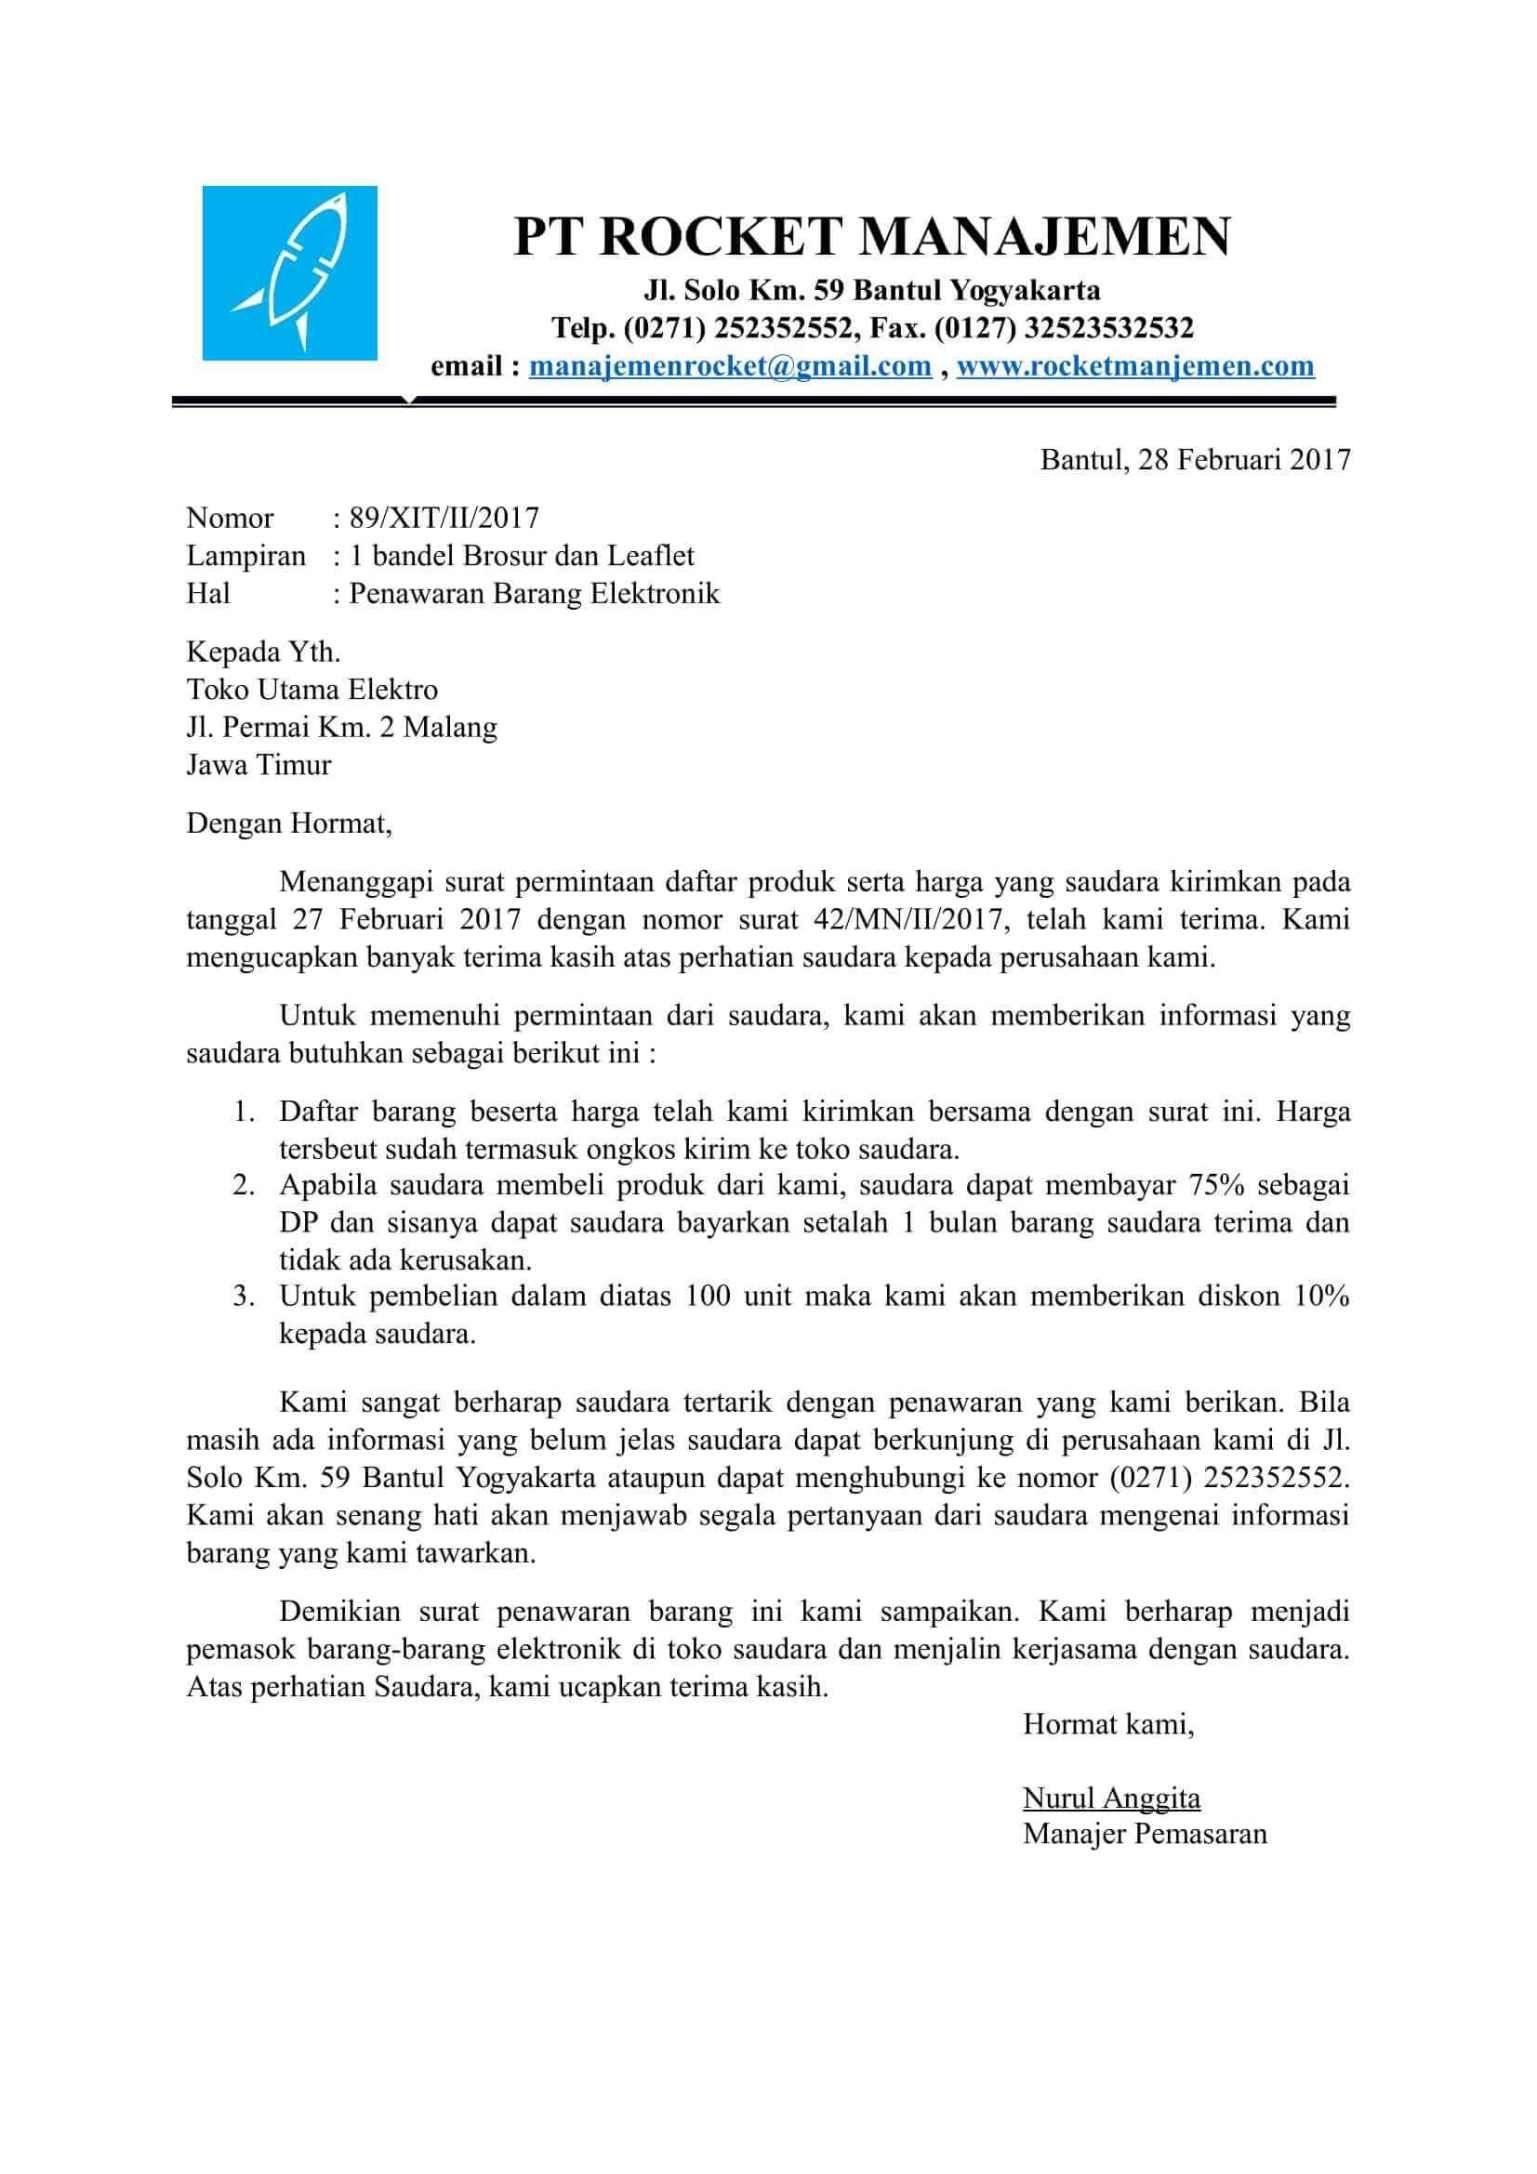 Contoh Surat Penawaran Produk Elektronik Document Pinterest